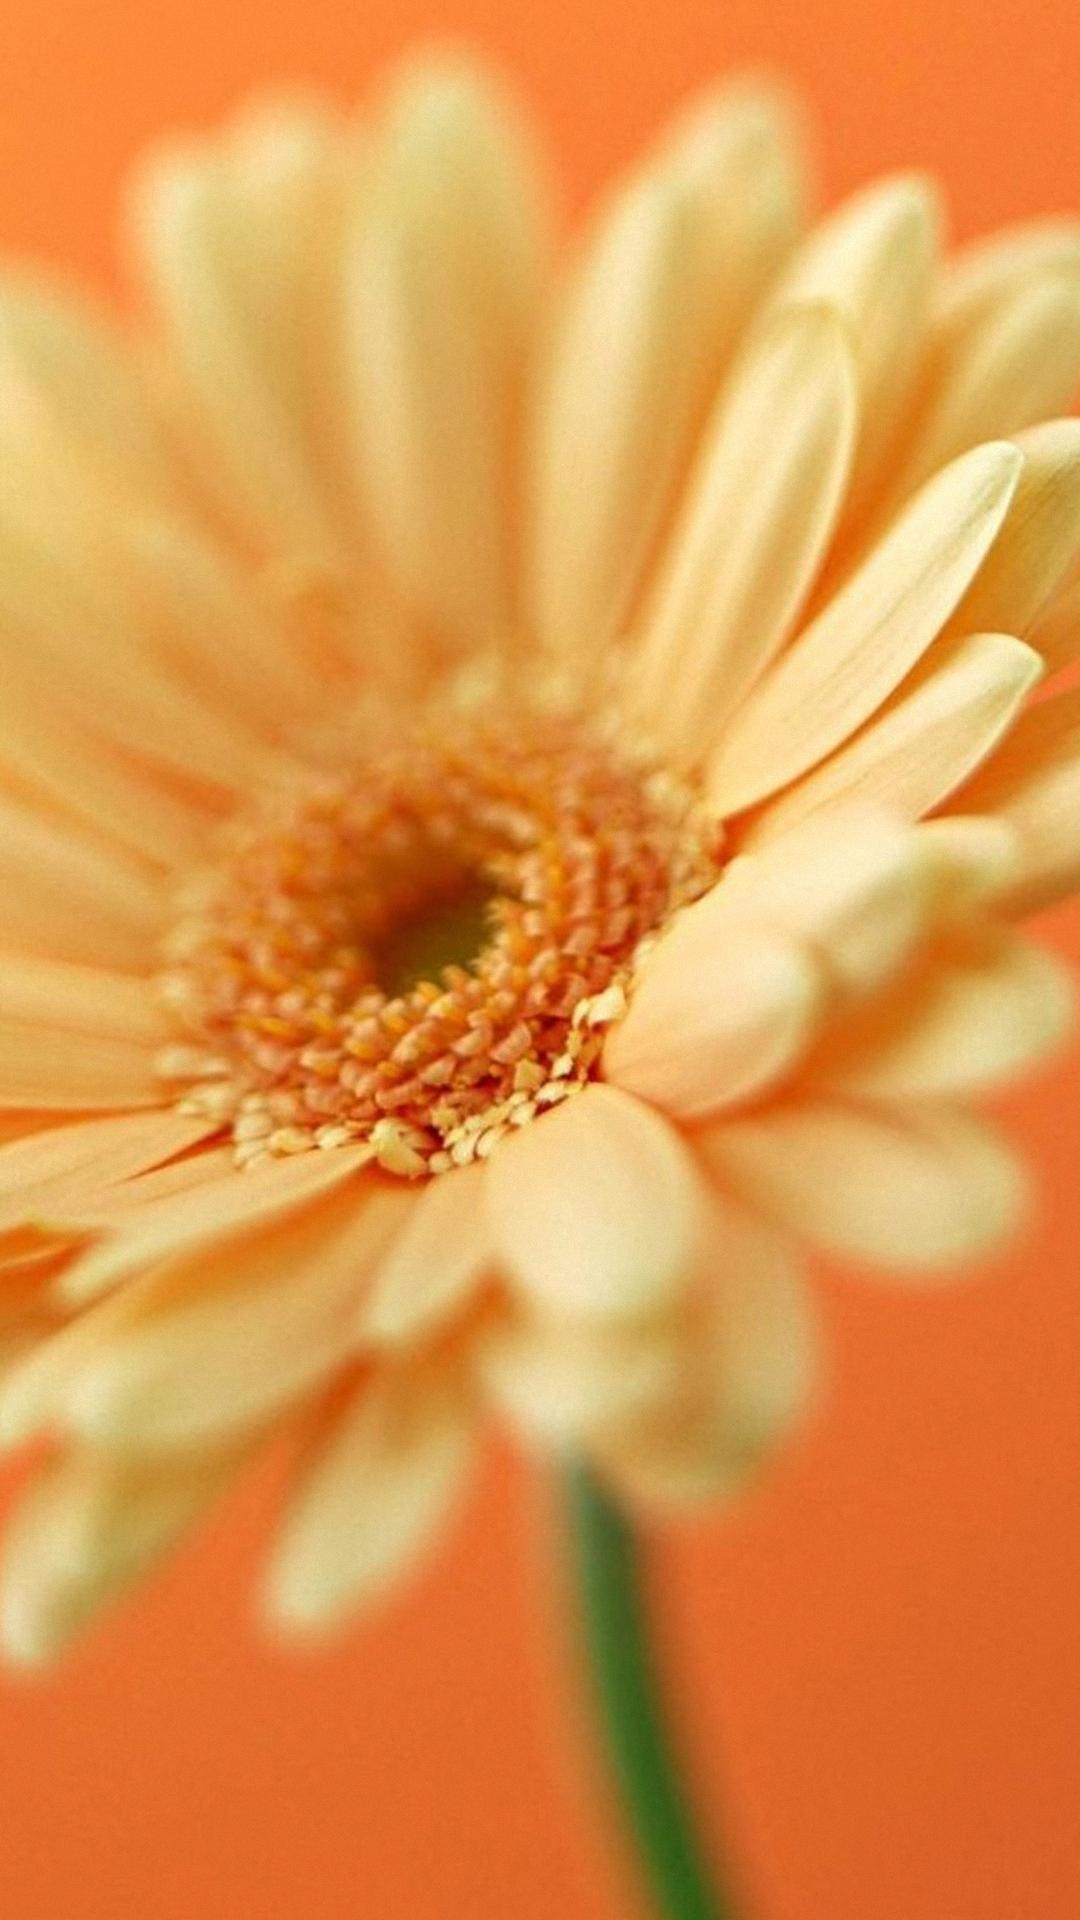 Hd Flori Flower Samsung Galaxy S4 S5 Wallpapers Hd Wallpaper For Samsung Galaxy Flower 1080x1920 Wallpaper Teahub Io